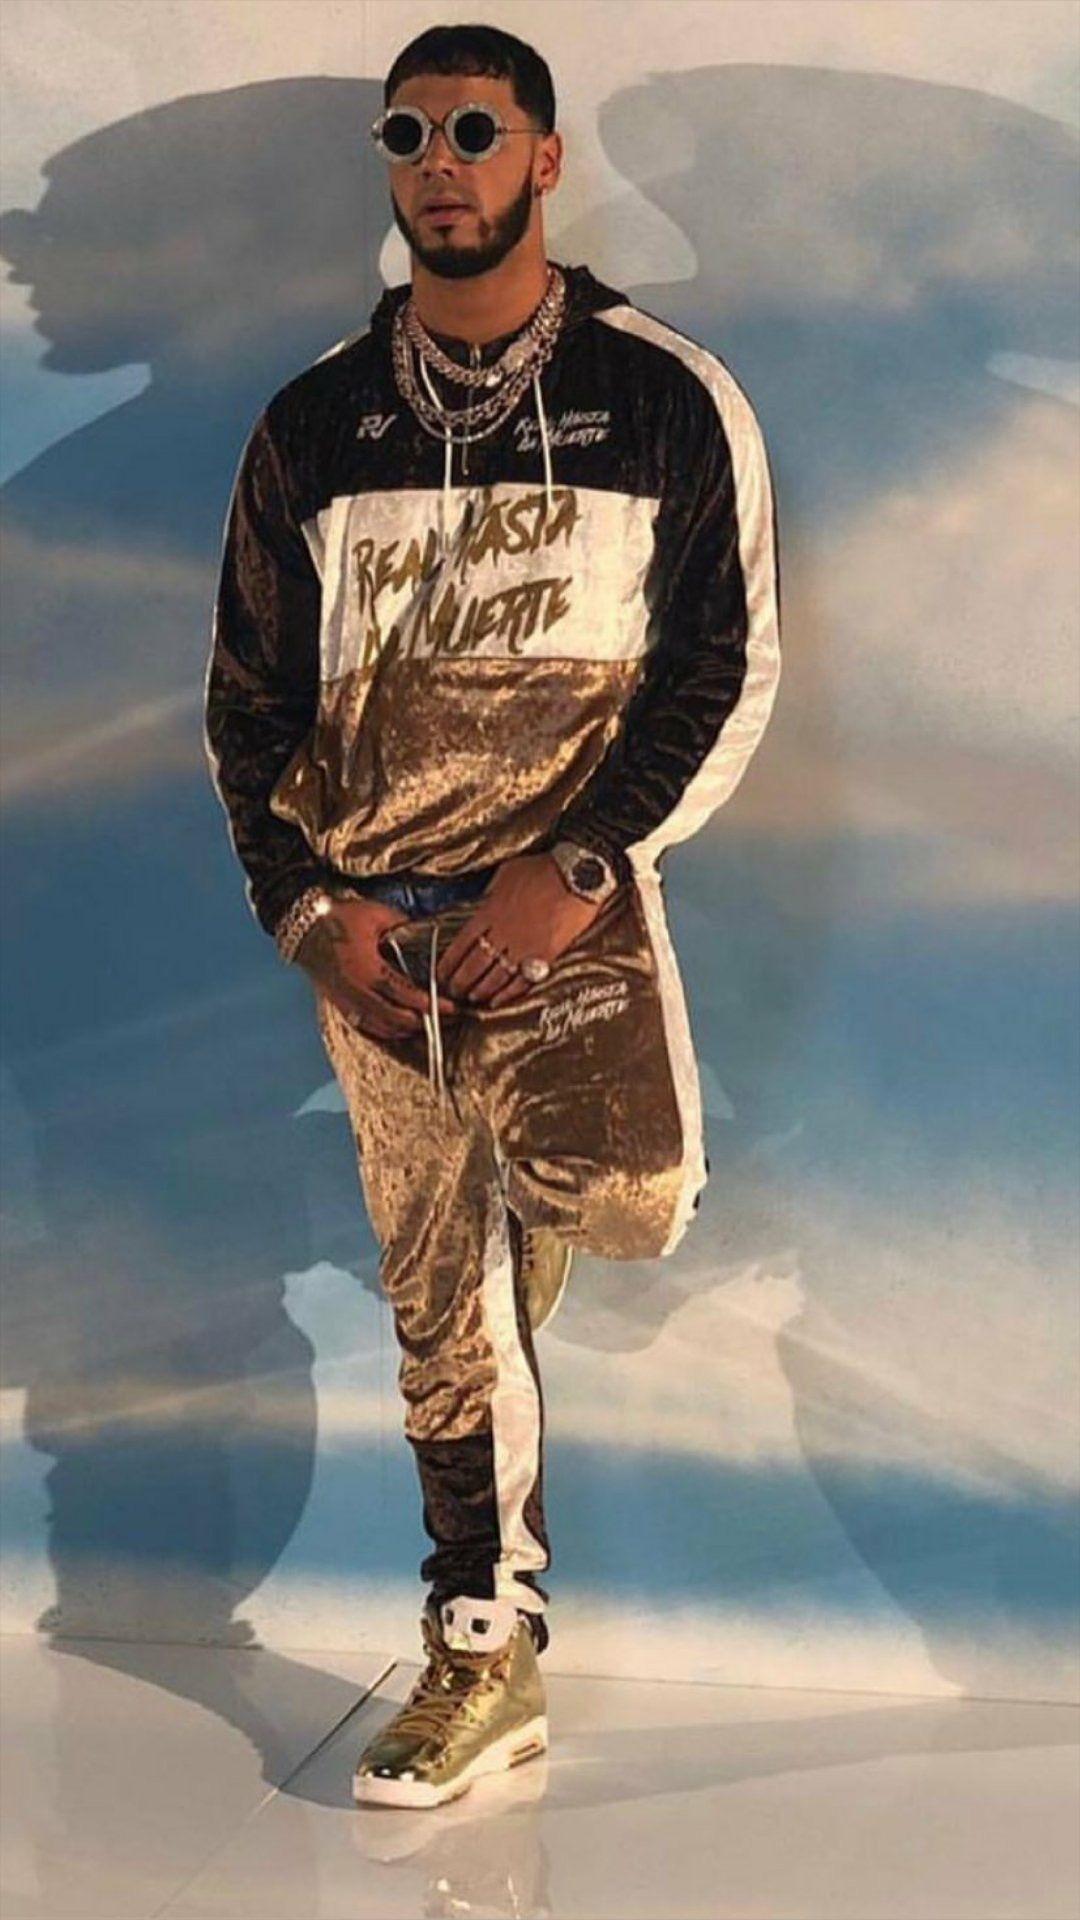 𝒑𝒊𝒏𝒕𝒆𝒓𝒆𝒔𝒕 Shawtypr Latin Artists Becky G Outfits Goku Black